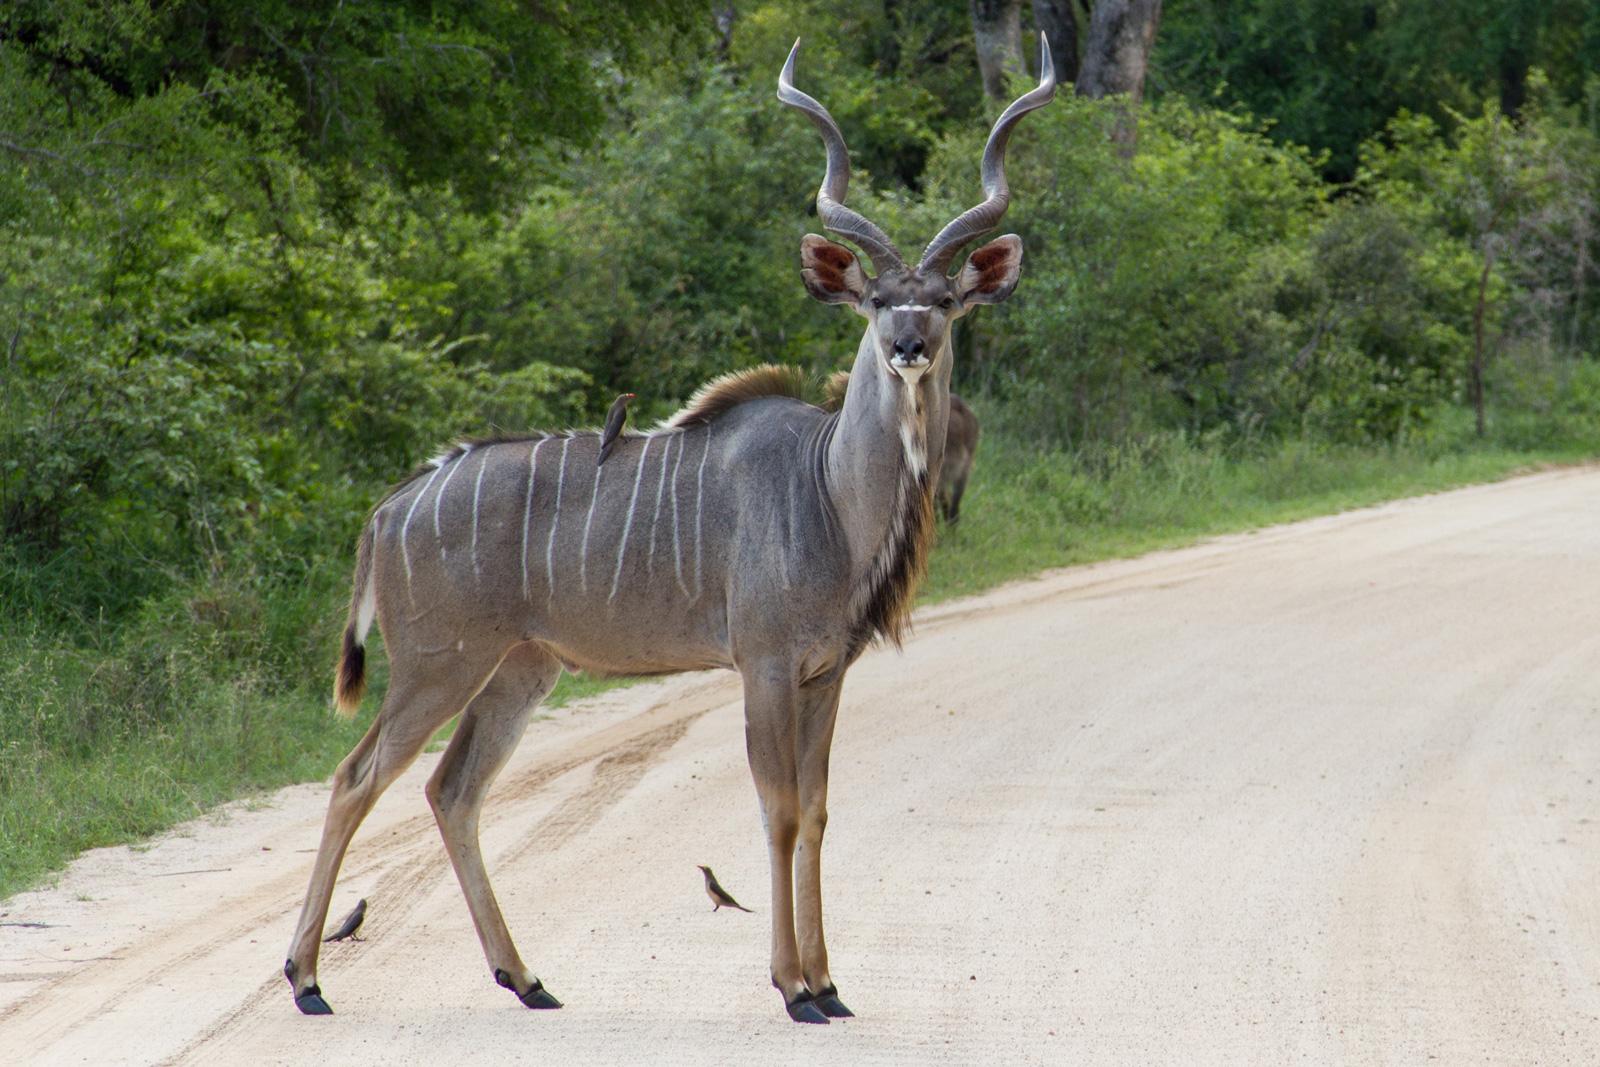 Kudu. Photo credit: Stefan Schäfer. https://commons.wikimedia.org/wiki/File:KuduKr%C3%BCger.jpg